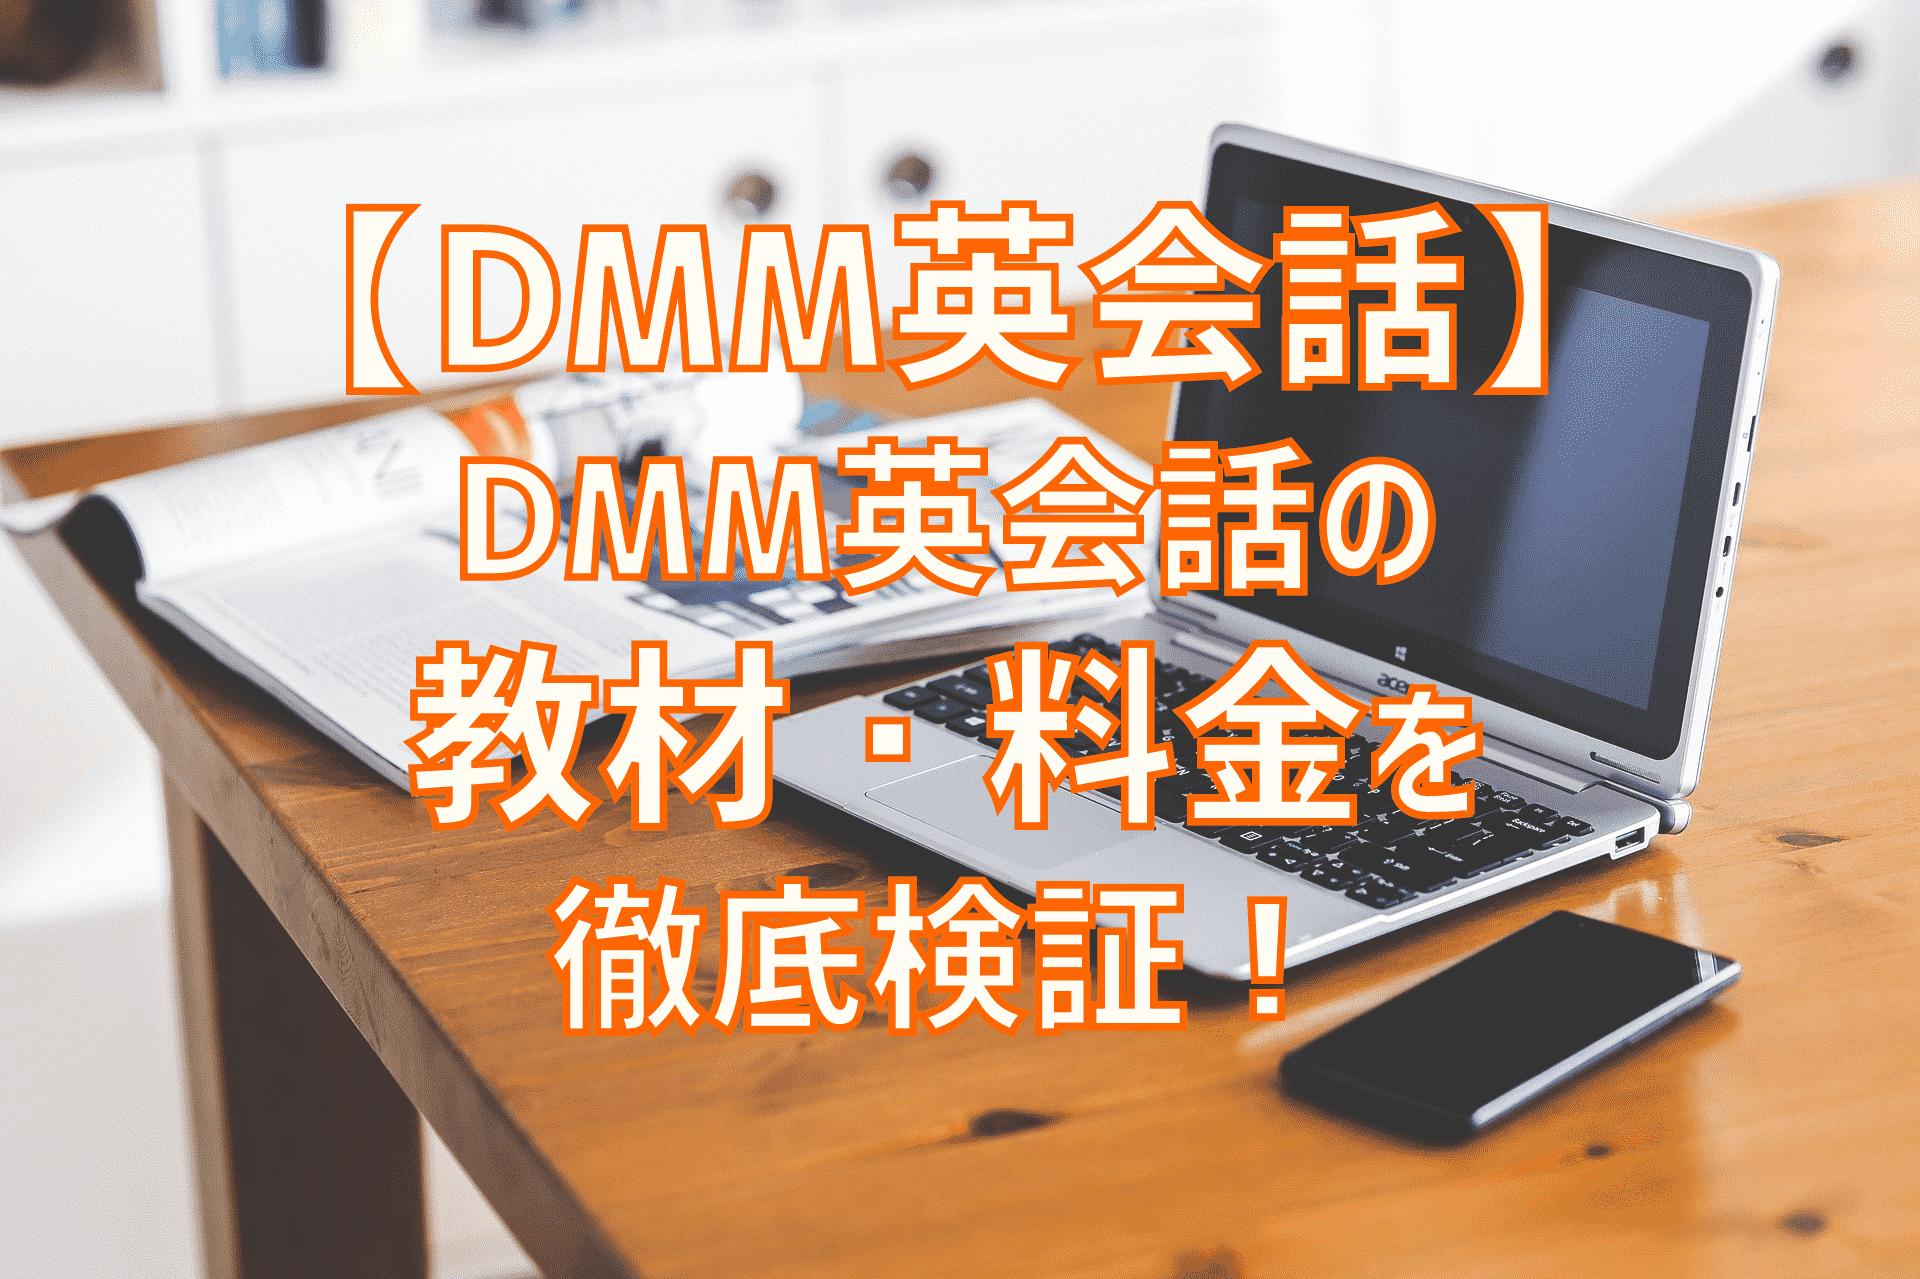 DMM英会話を2ヶ月やってみた!DMM英会話の教材・料金を徹底検証